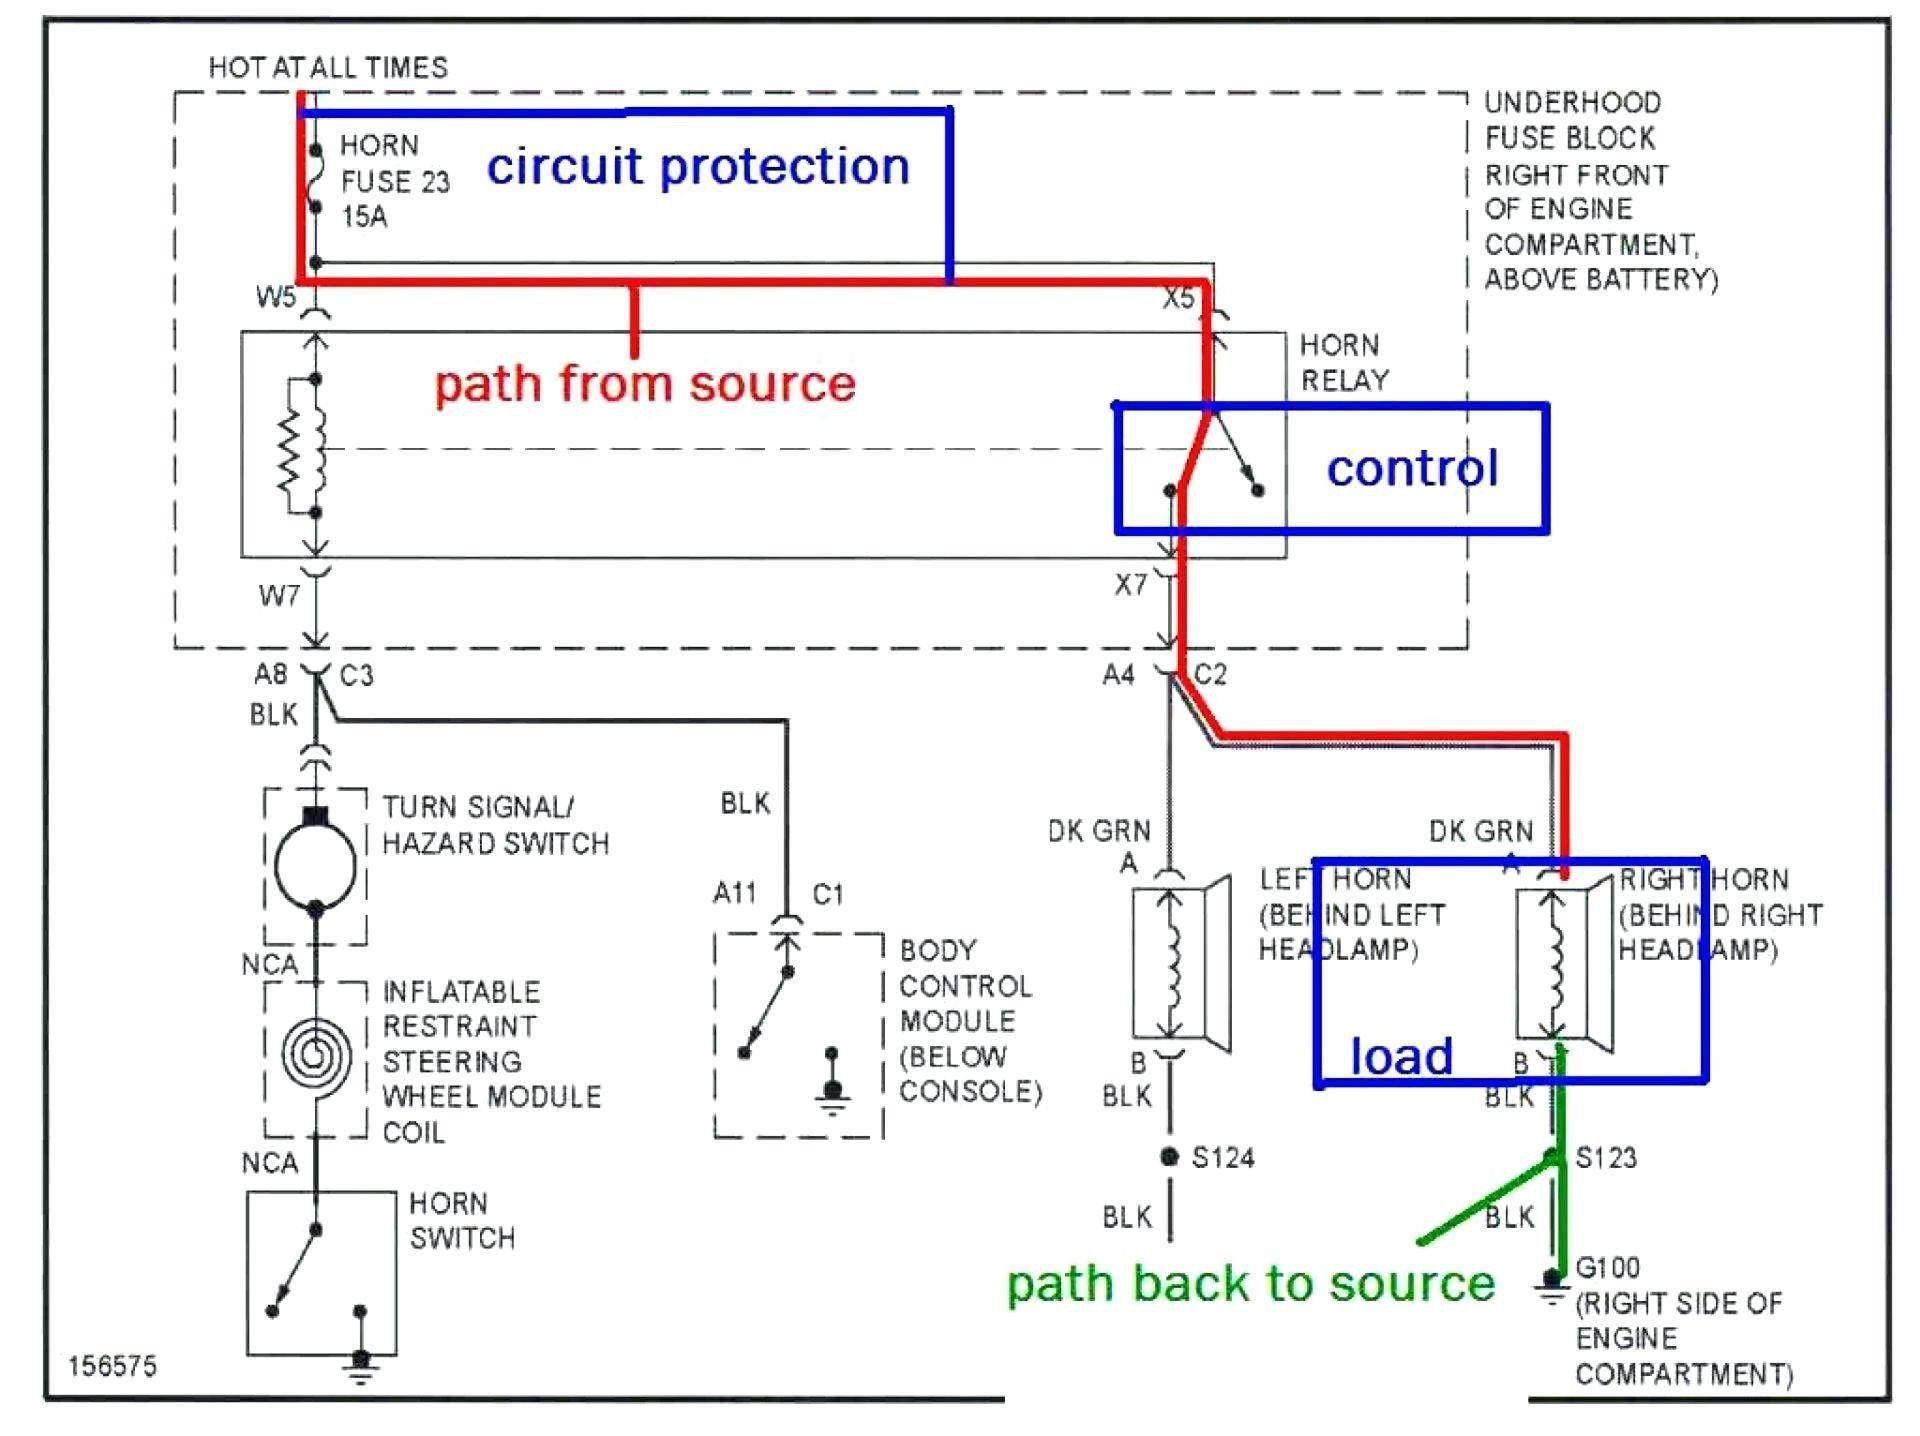 Unique Wiring Diagram Garage Door Sensor Diagram Diagramsample Diagramtemplate Wiringdiagram Diagramchart Works Electrical Diagram Diagram Diagram Design